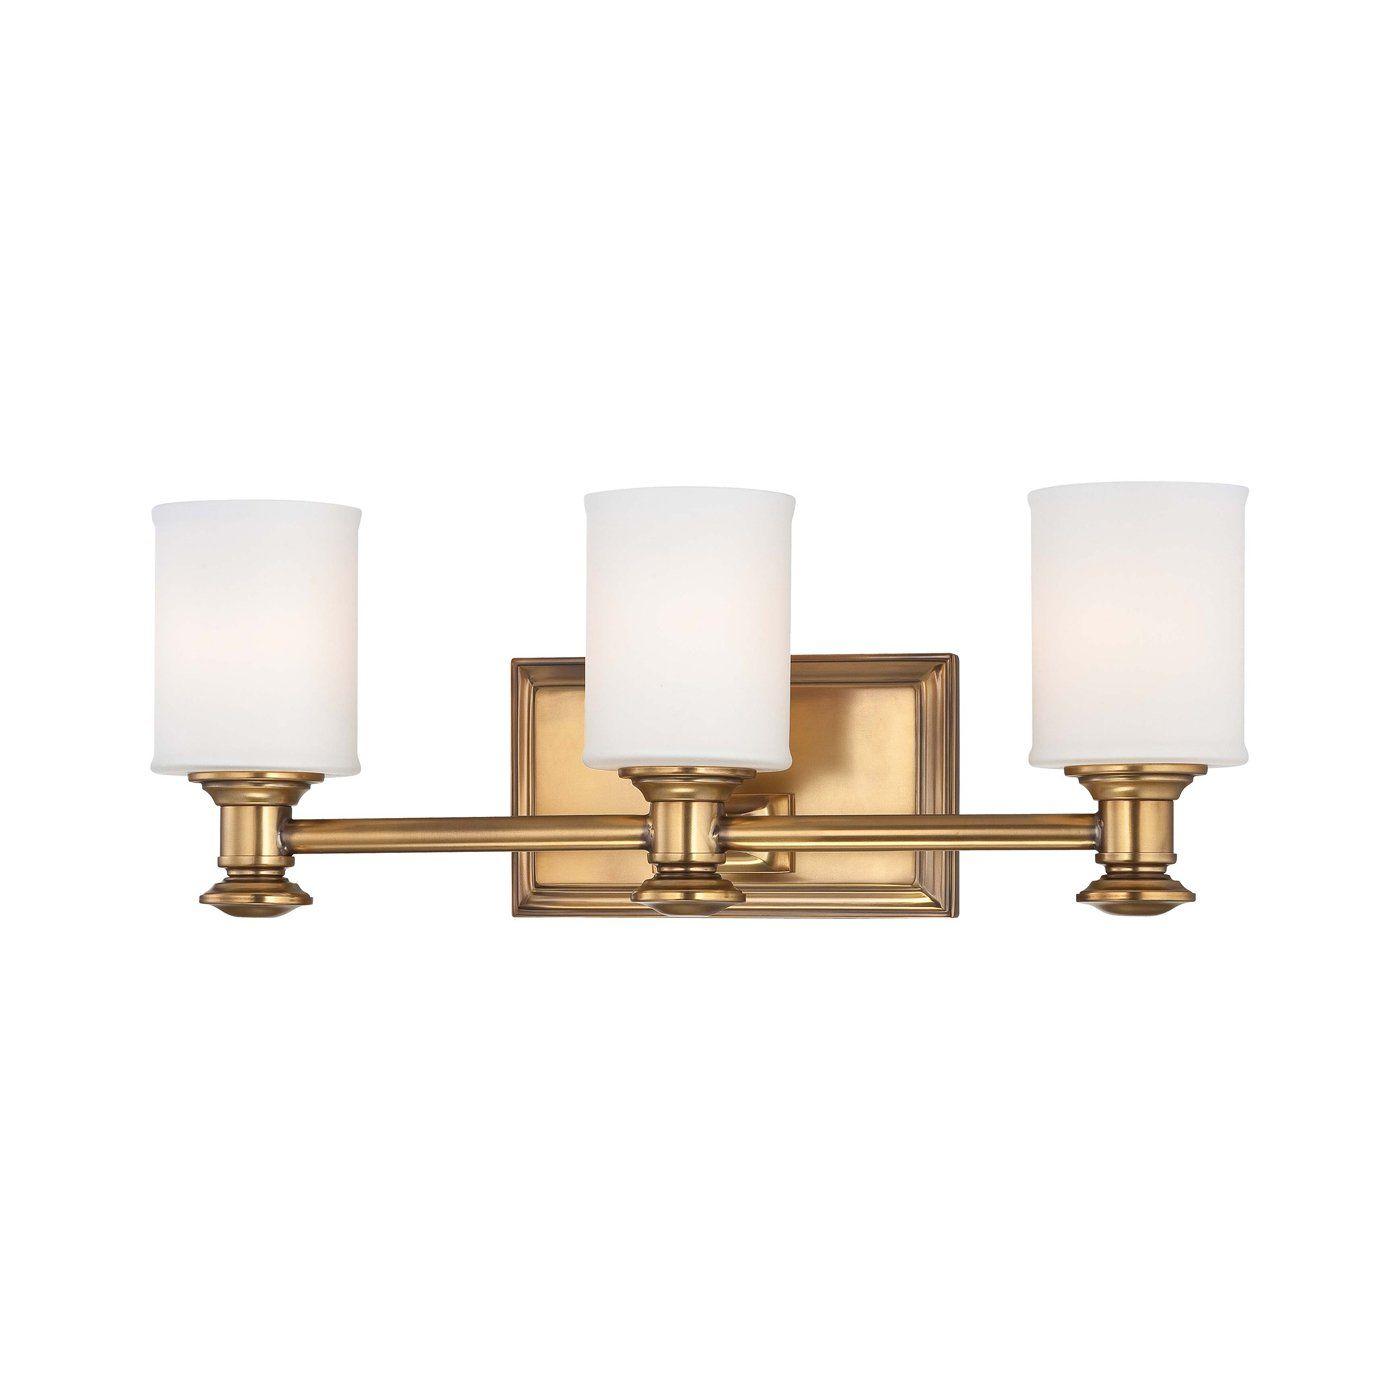 minka lavery bathroom lighting. Minka Lavery 5173-249 Harbour Point 3 Light Bathroom | ATG Stores Lighting R